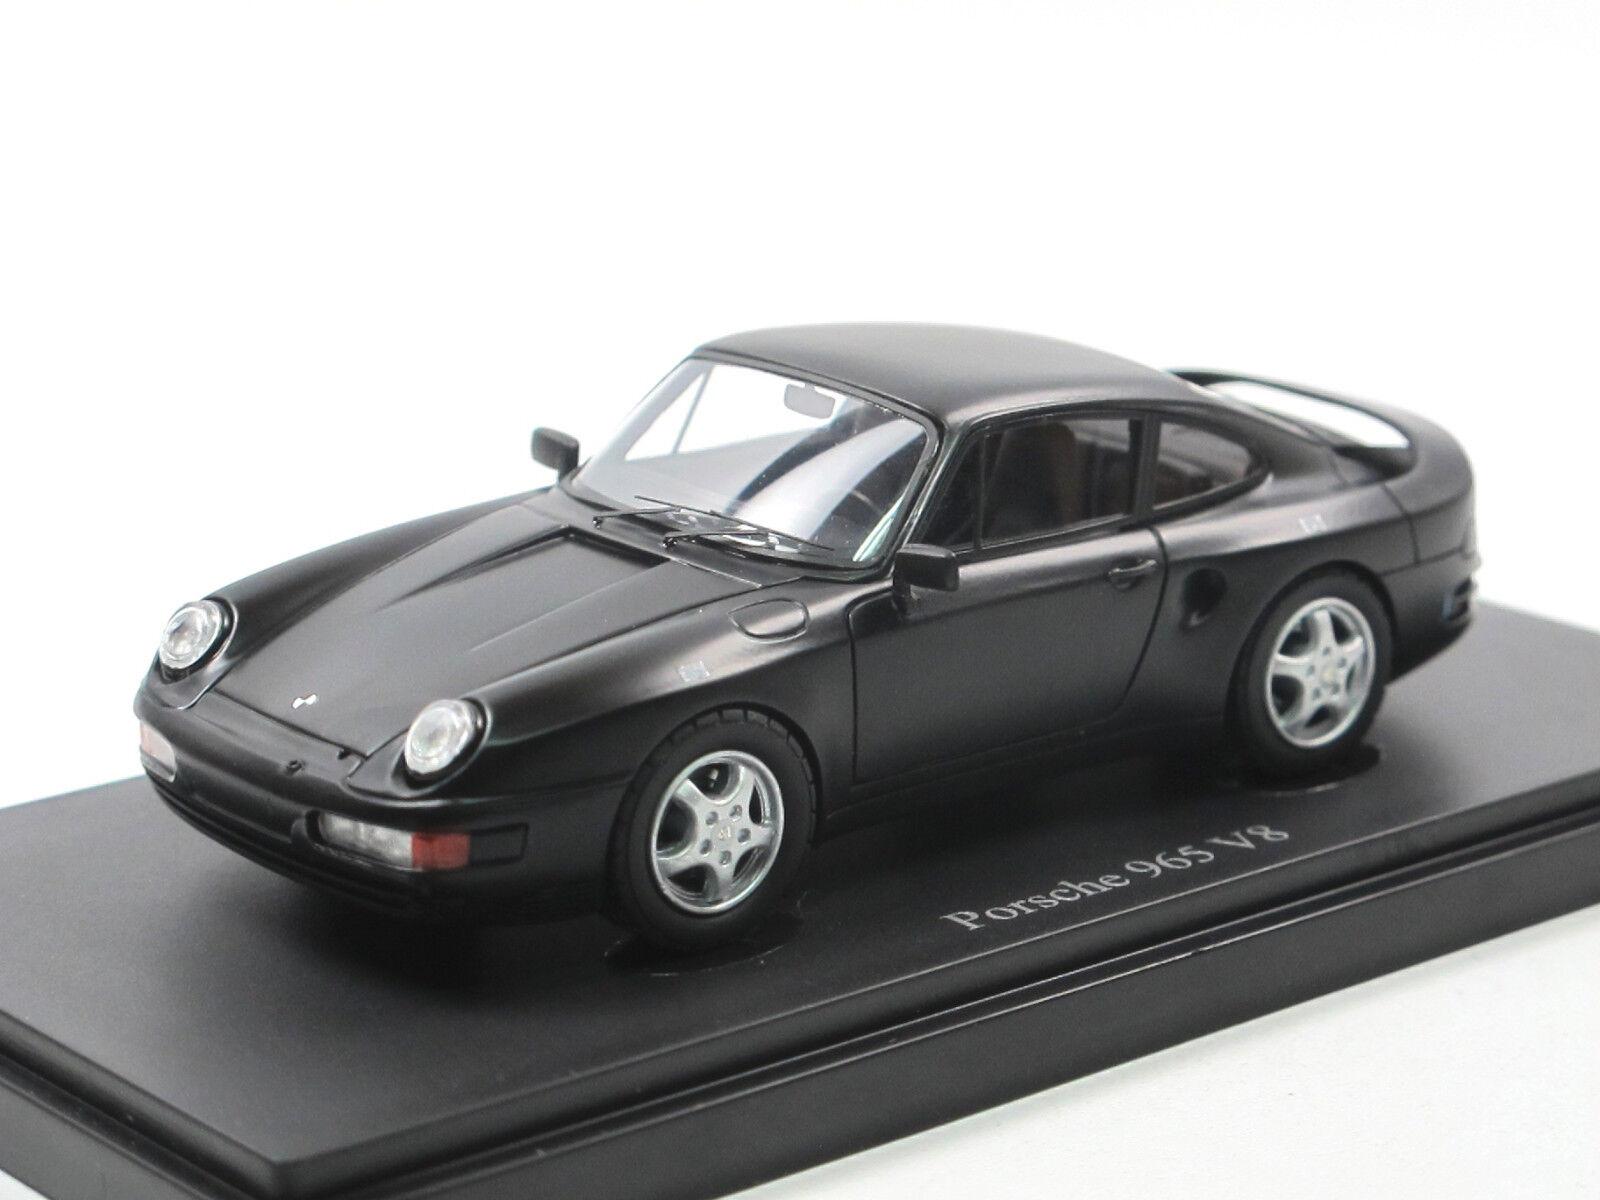 Autocult 06031 1988 porsche 965 v8 prototyp matt schwarz 1   43 neuheit limitiert